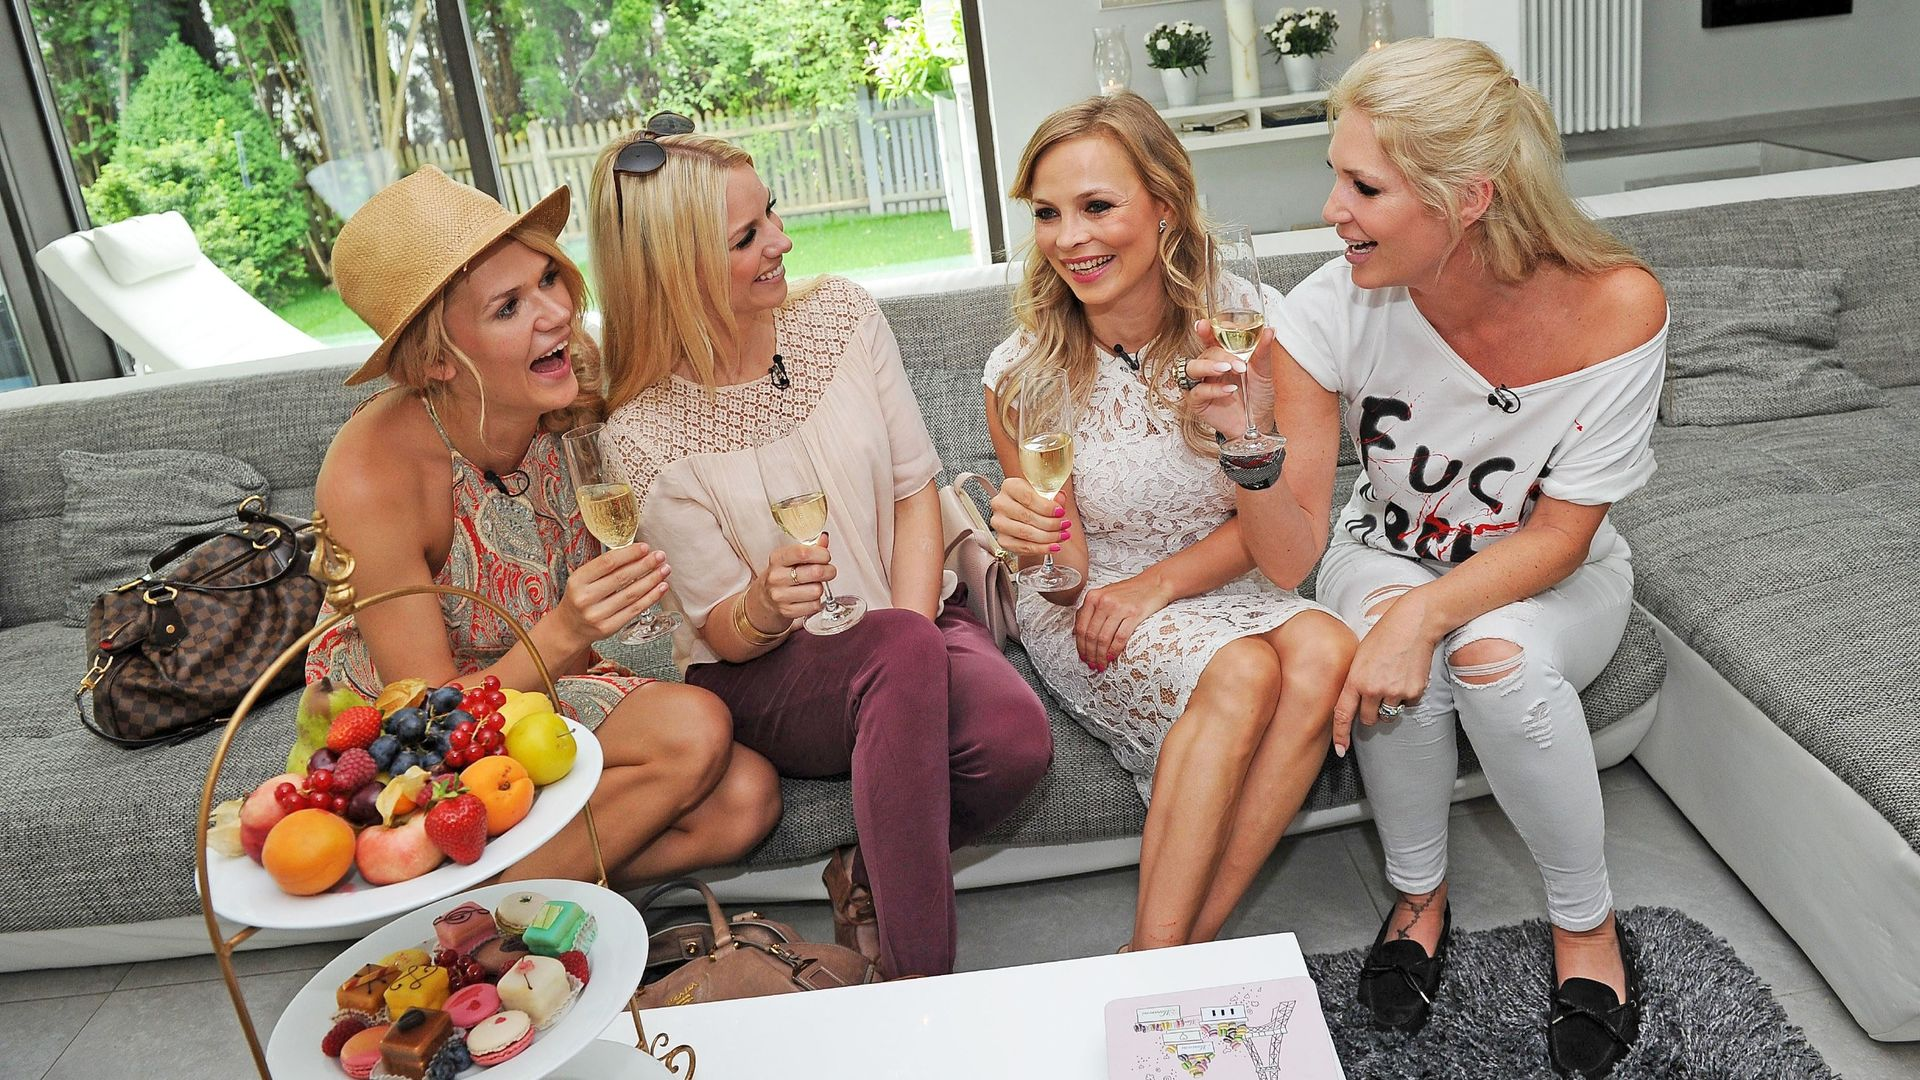 promi shopping queen blondinen quartett sucht sexy jumpsuit. Black Bedroom Furniture Sets. Home Design Ideas